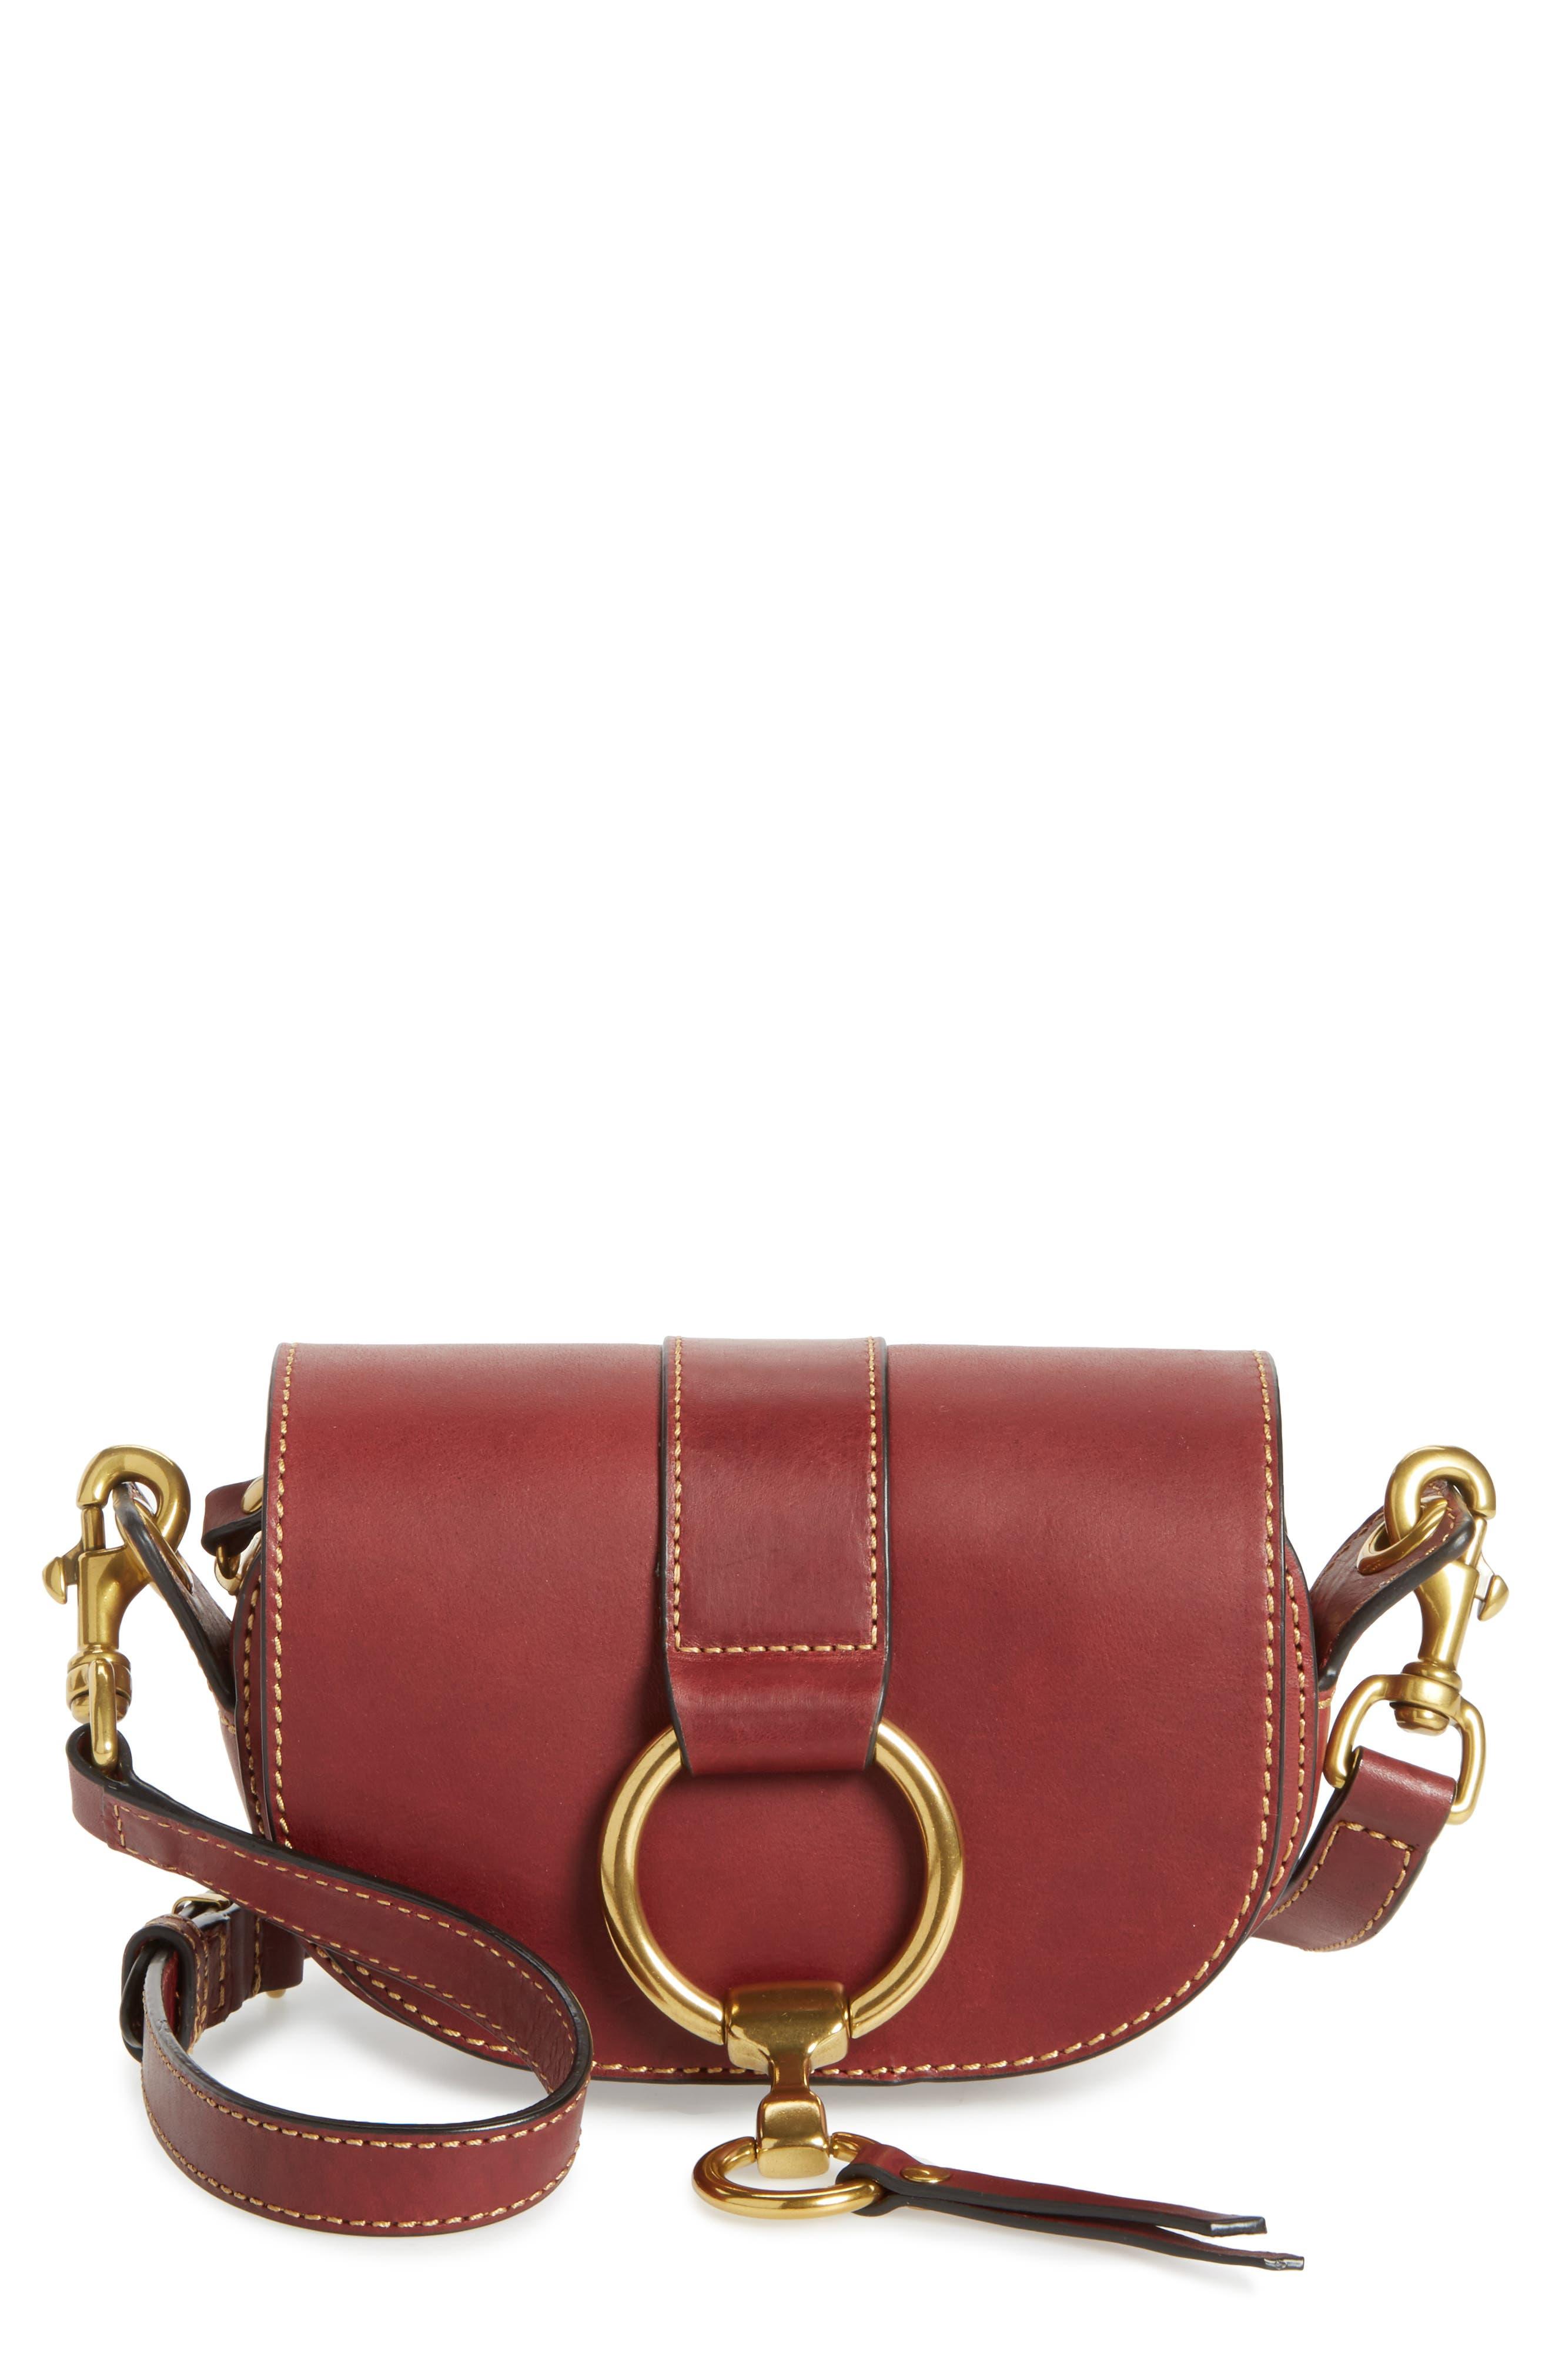 Frye Mini Ilana Harness Leather Saddle Bag